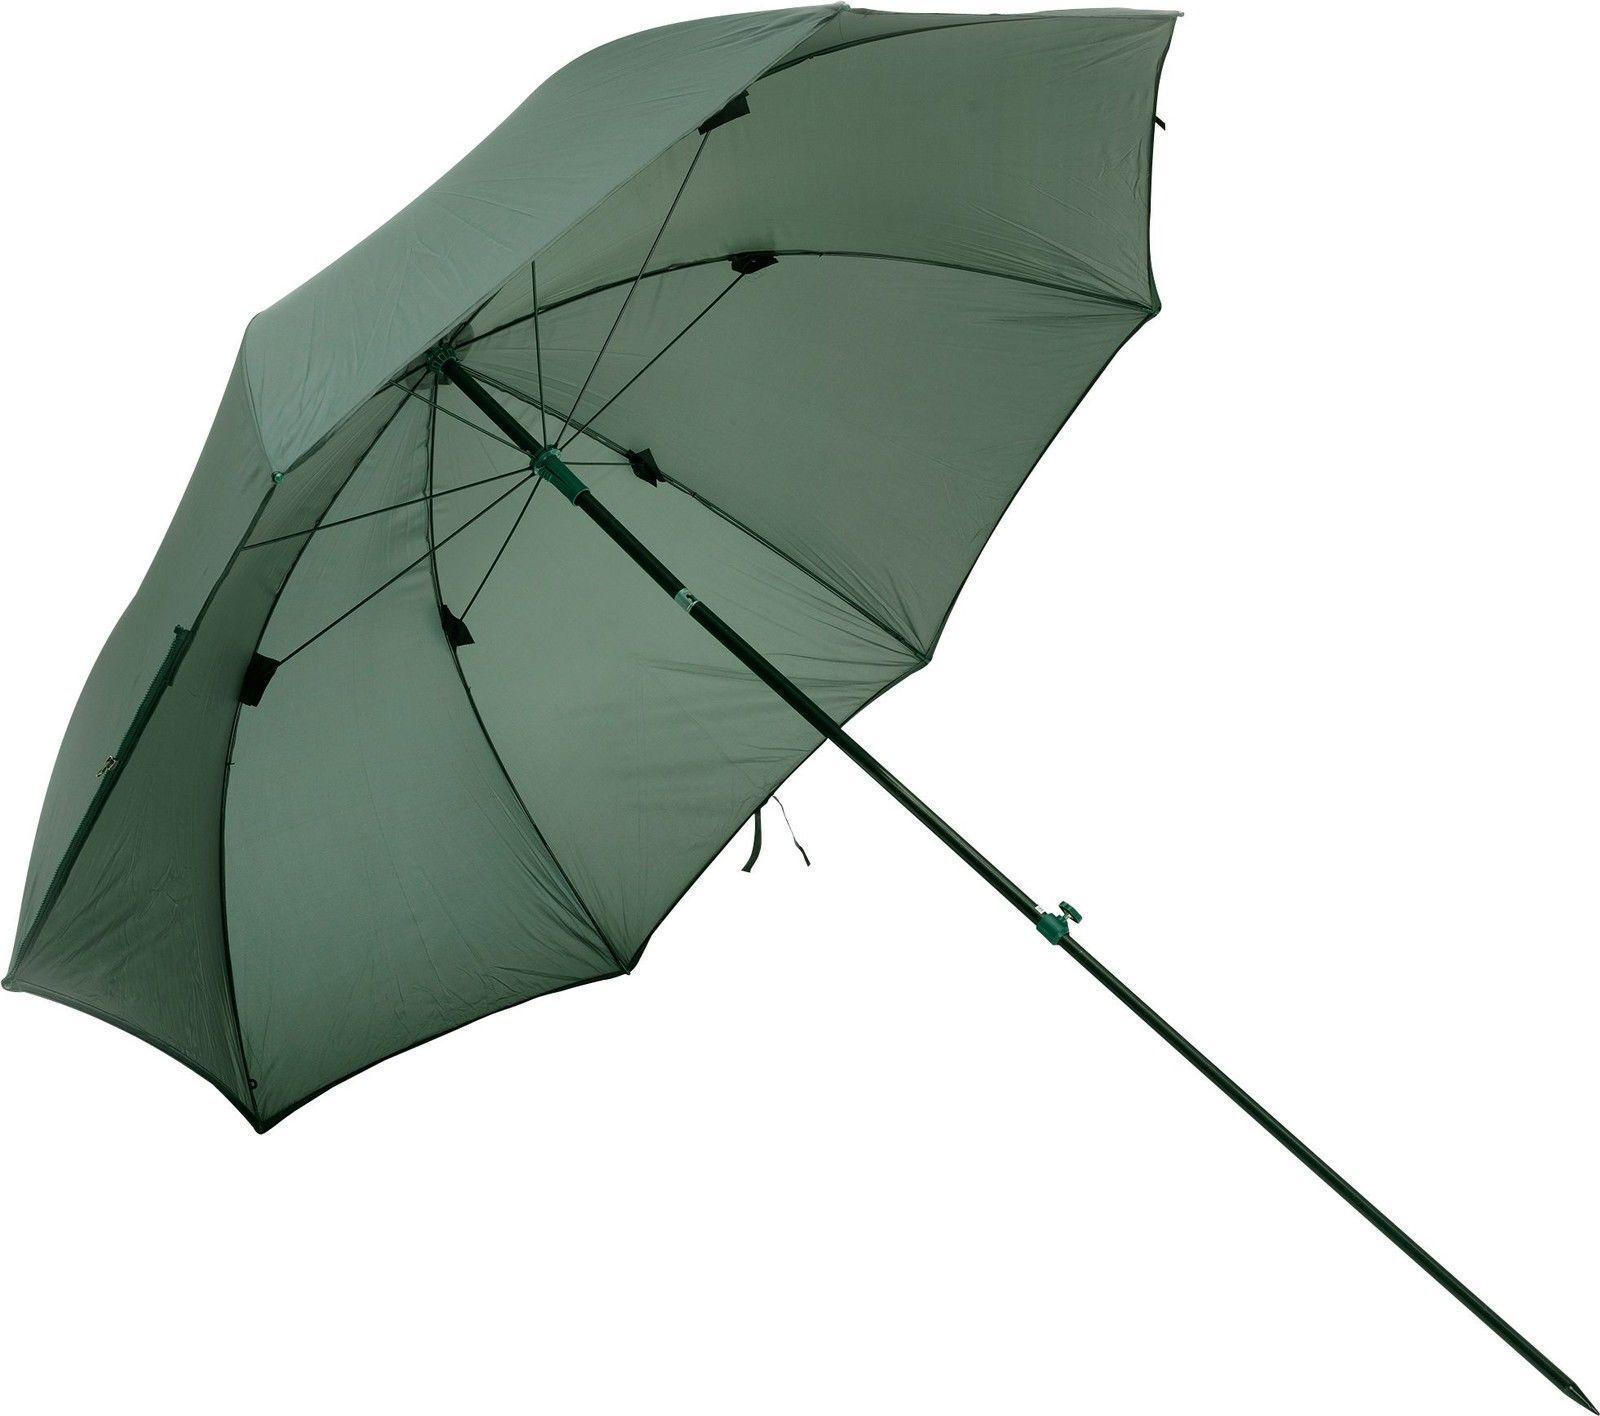 Keenets Waterproof Shelter Fishing Umbrella -  Green 210T Polyester Fabric  healthy